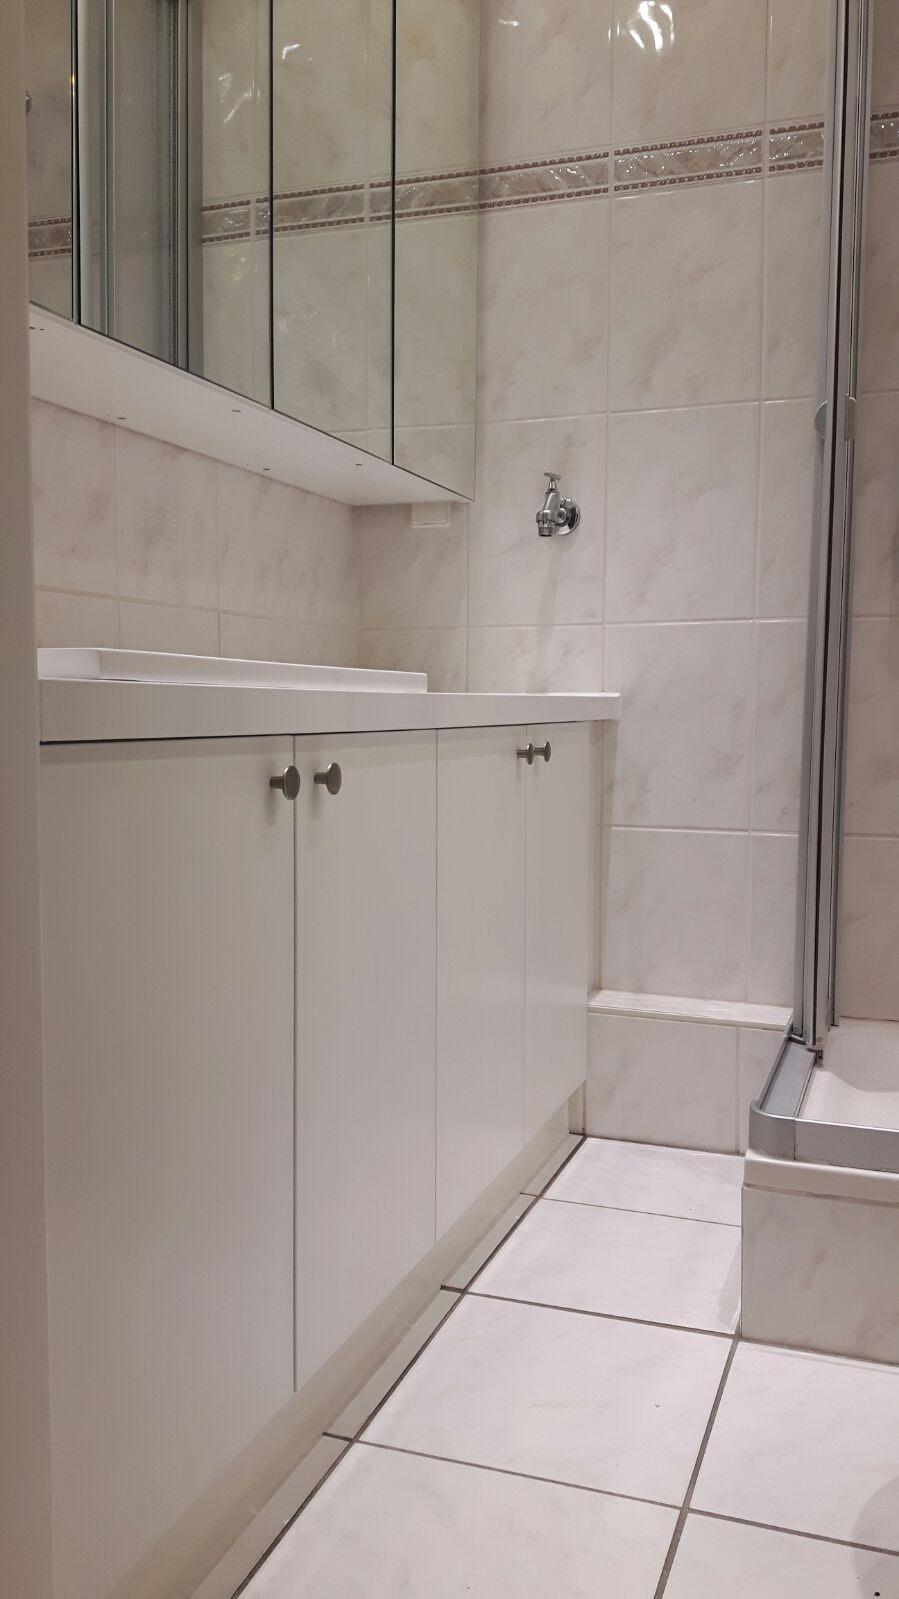 tischlerei-herling-individuelle-moebel-badezimmer - HerlingHerling